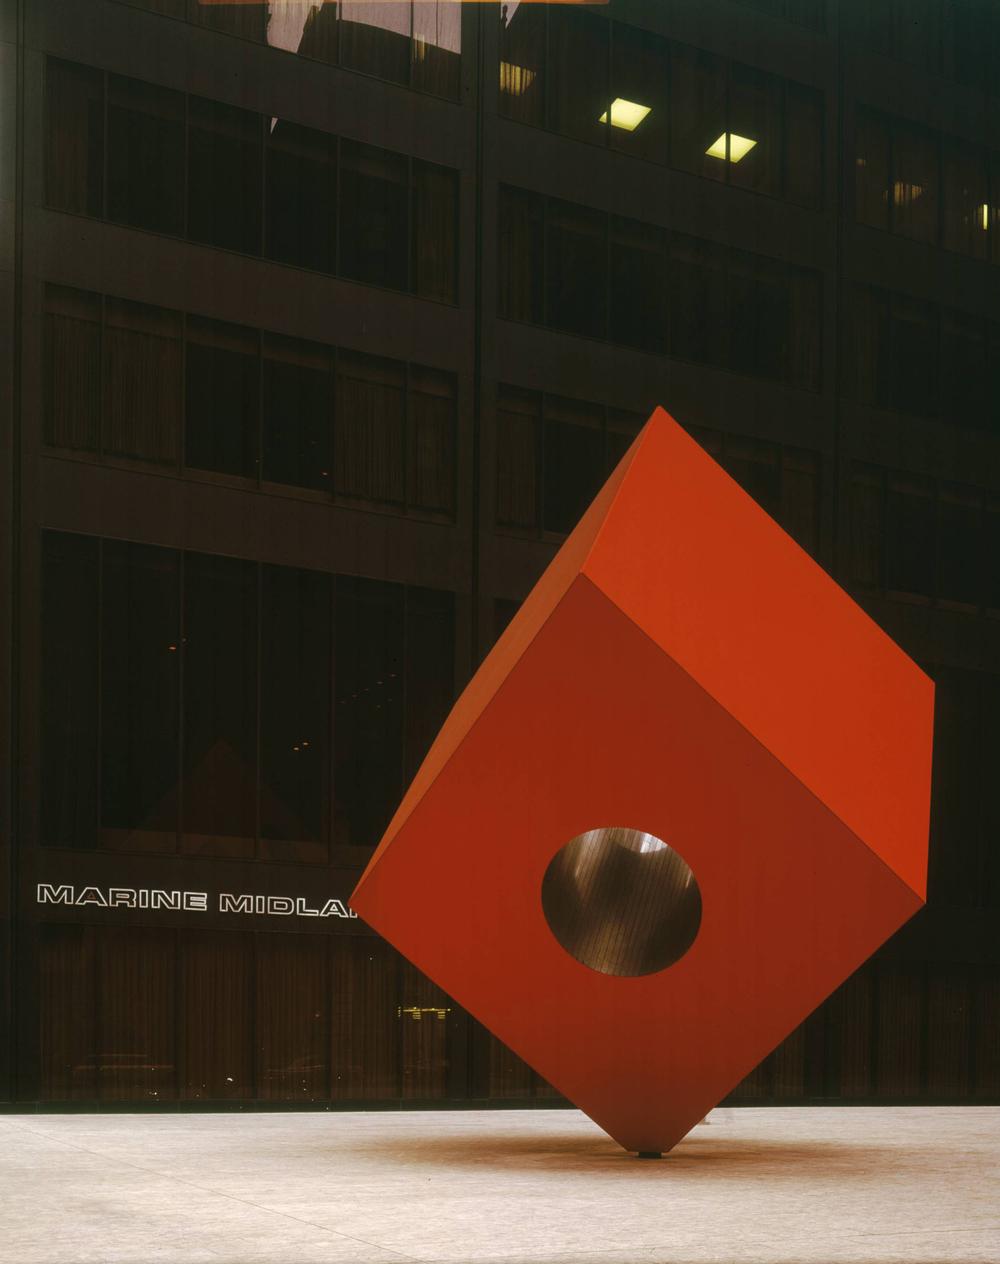 Red Cube , 1968. Isamu Noguchi. Steel, Paint. ©The Isamu Noguchi Foundation and Garden Museum, New York / ARS. Photo by Michio Noguchi.